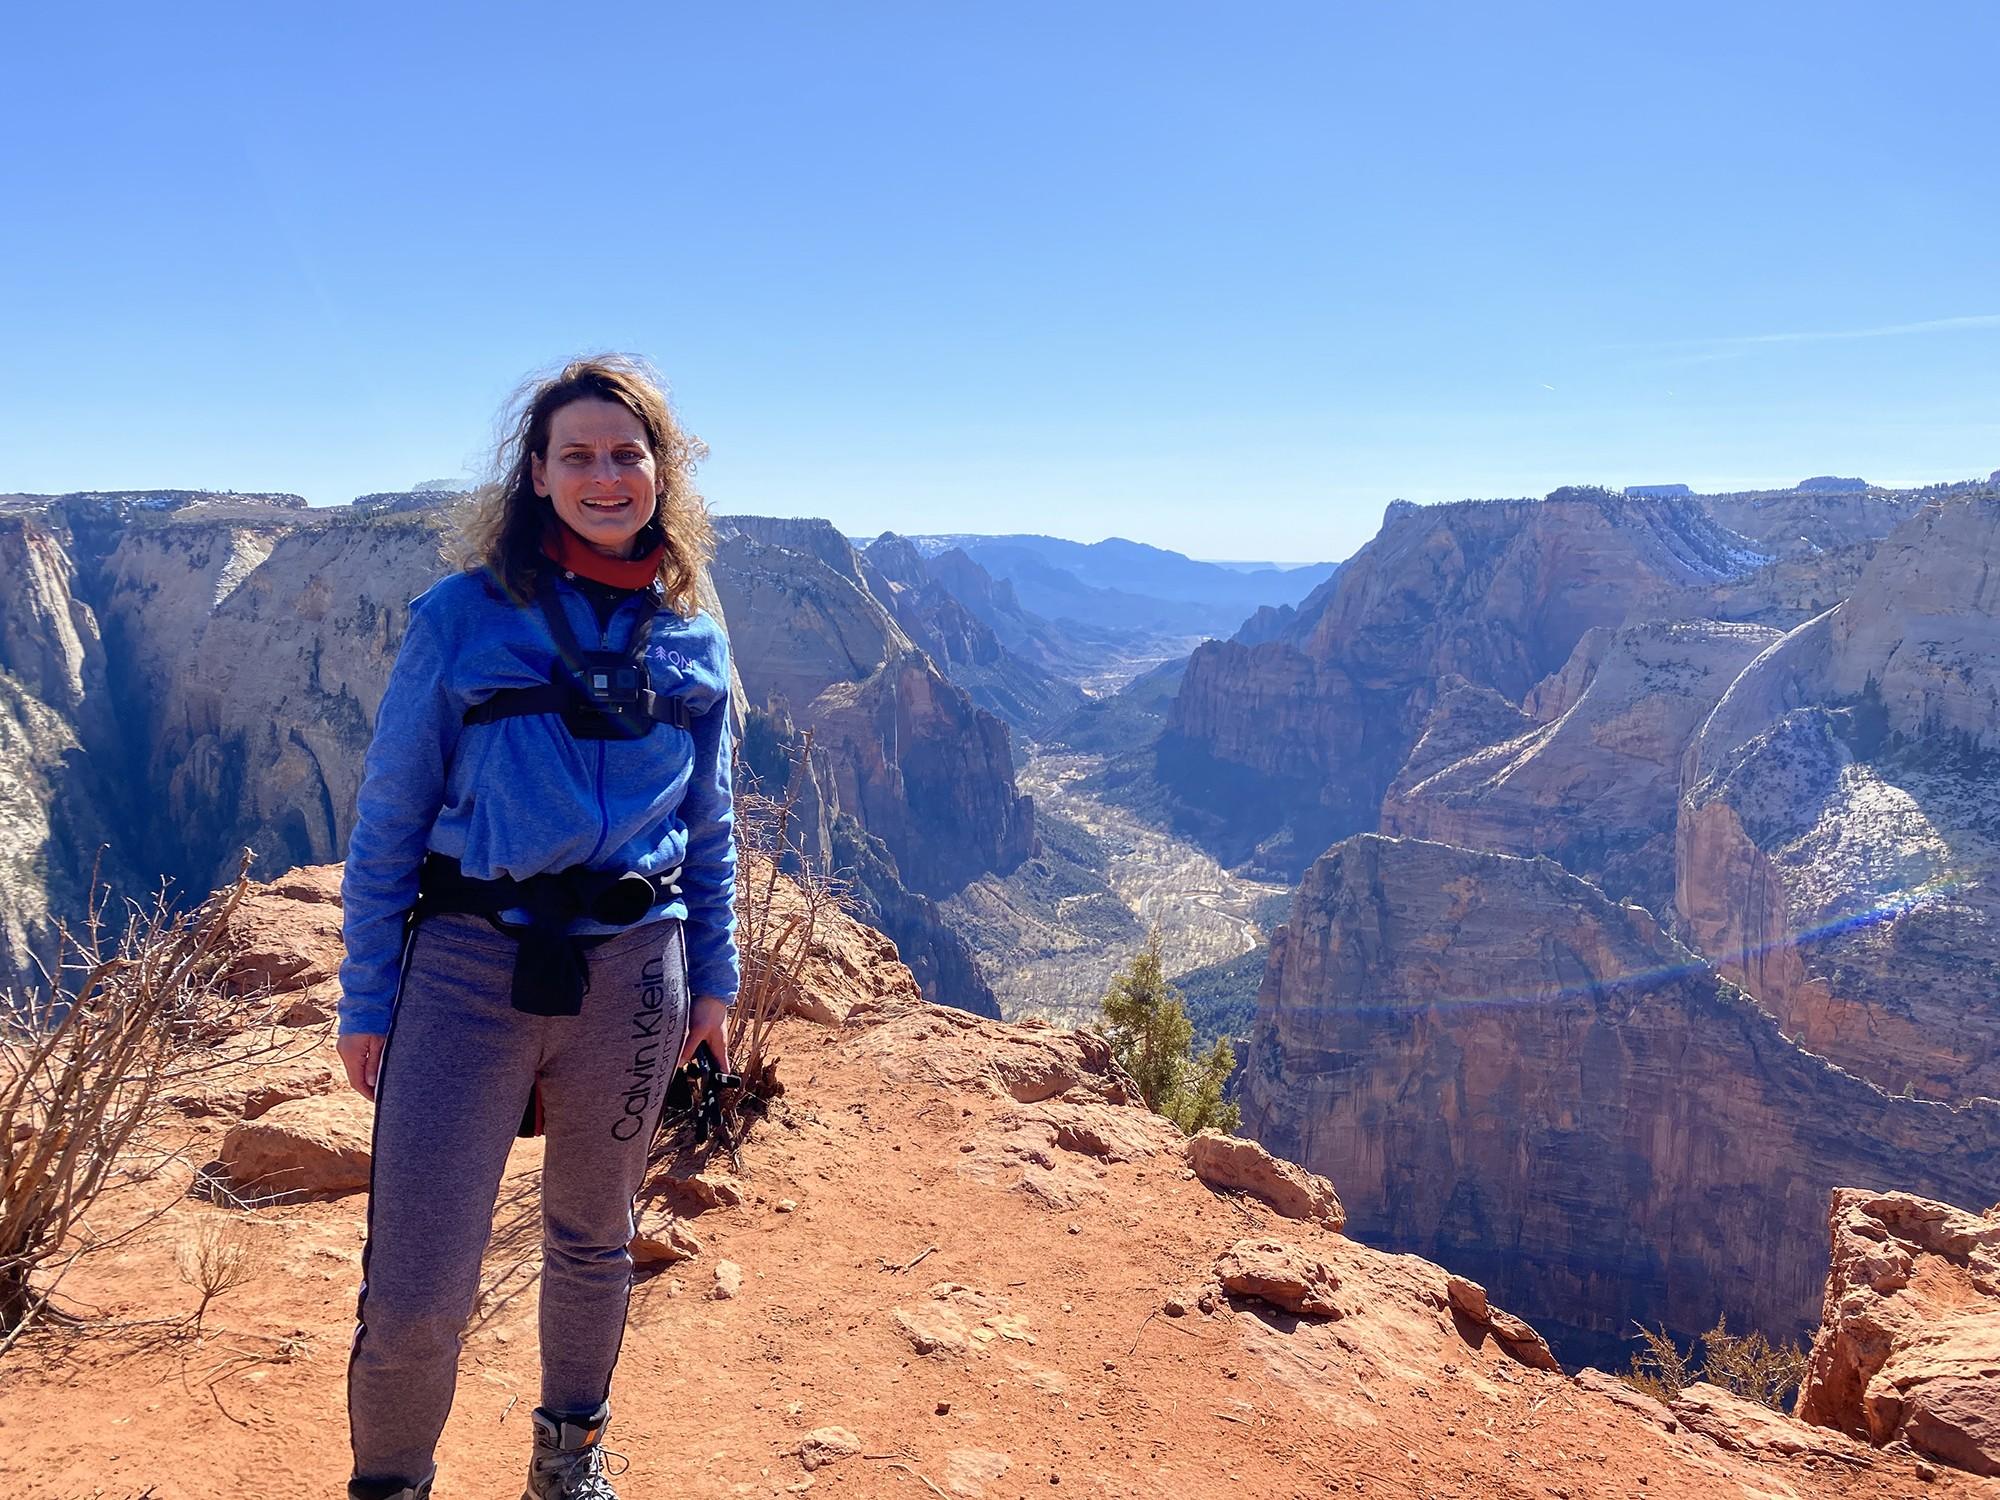 Jennifer at Observation Point in Zion National Park.